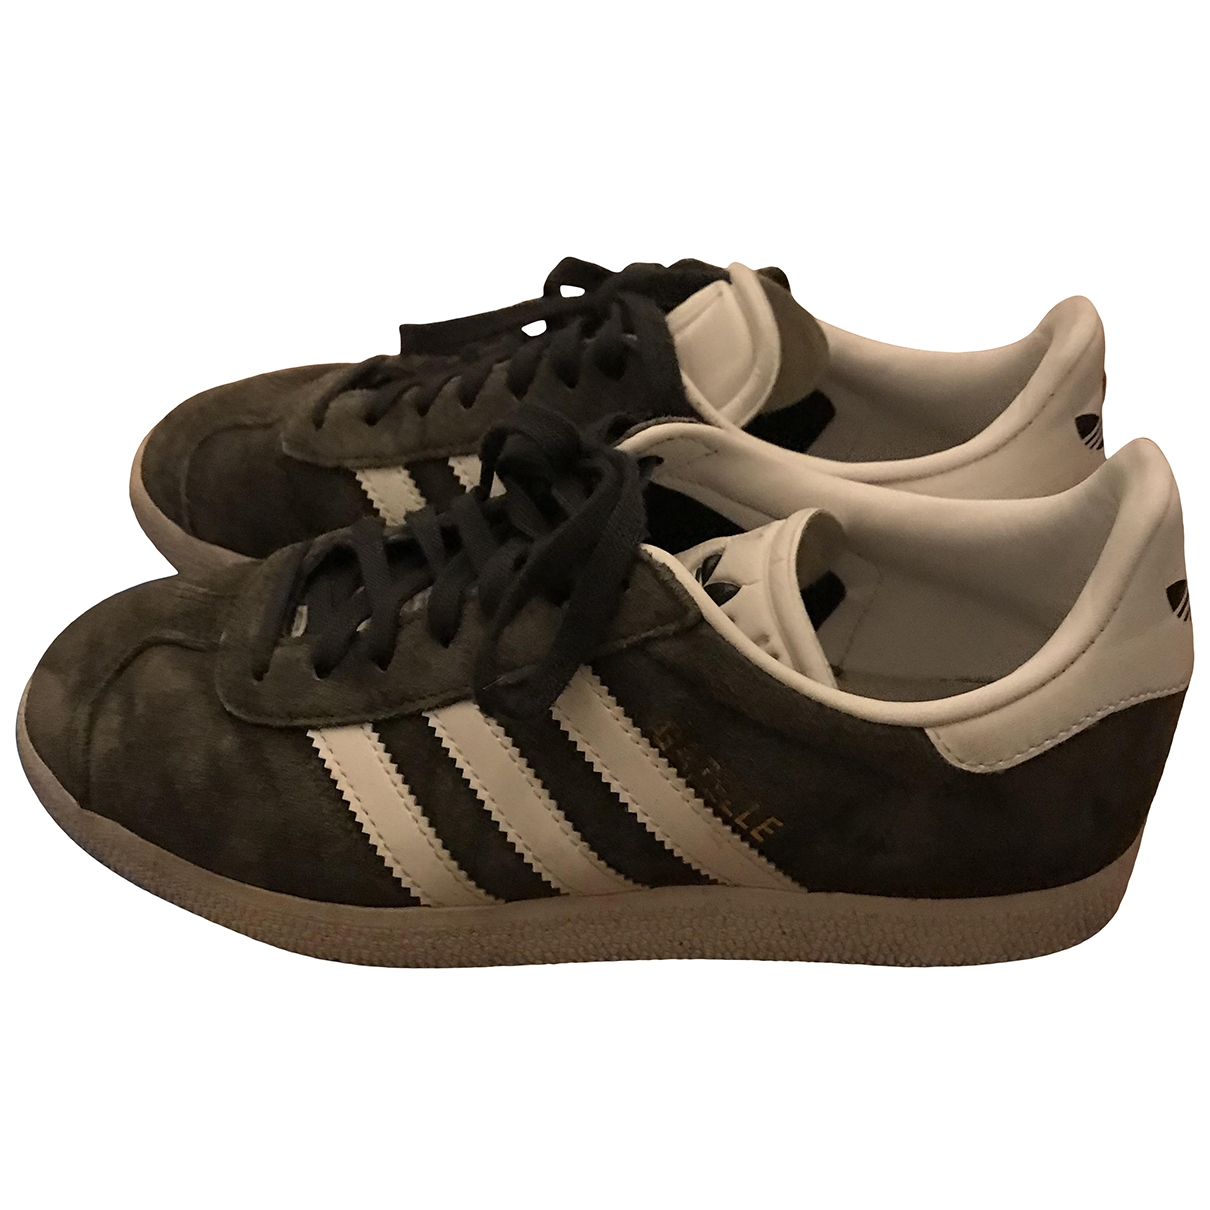 Adidas Gazelle Grey Suede Trainers for Women 36.5 EU